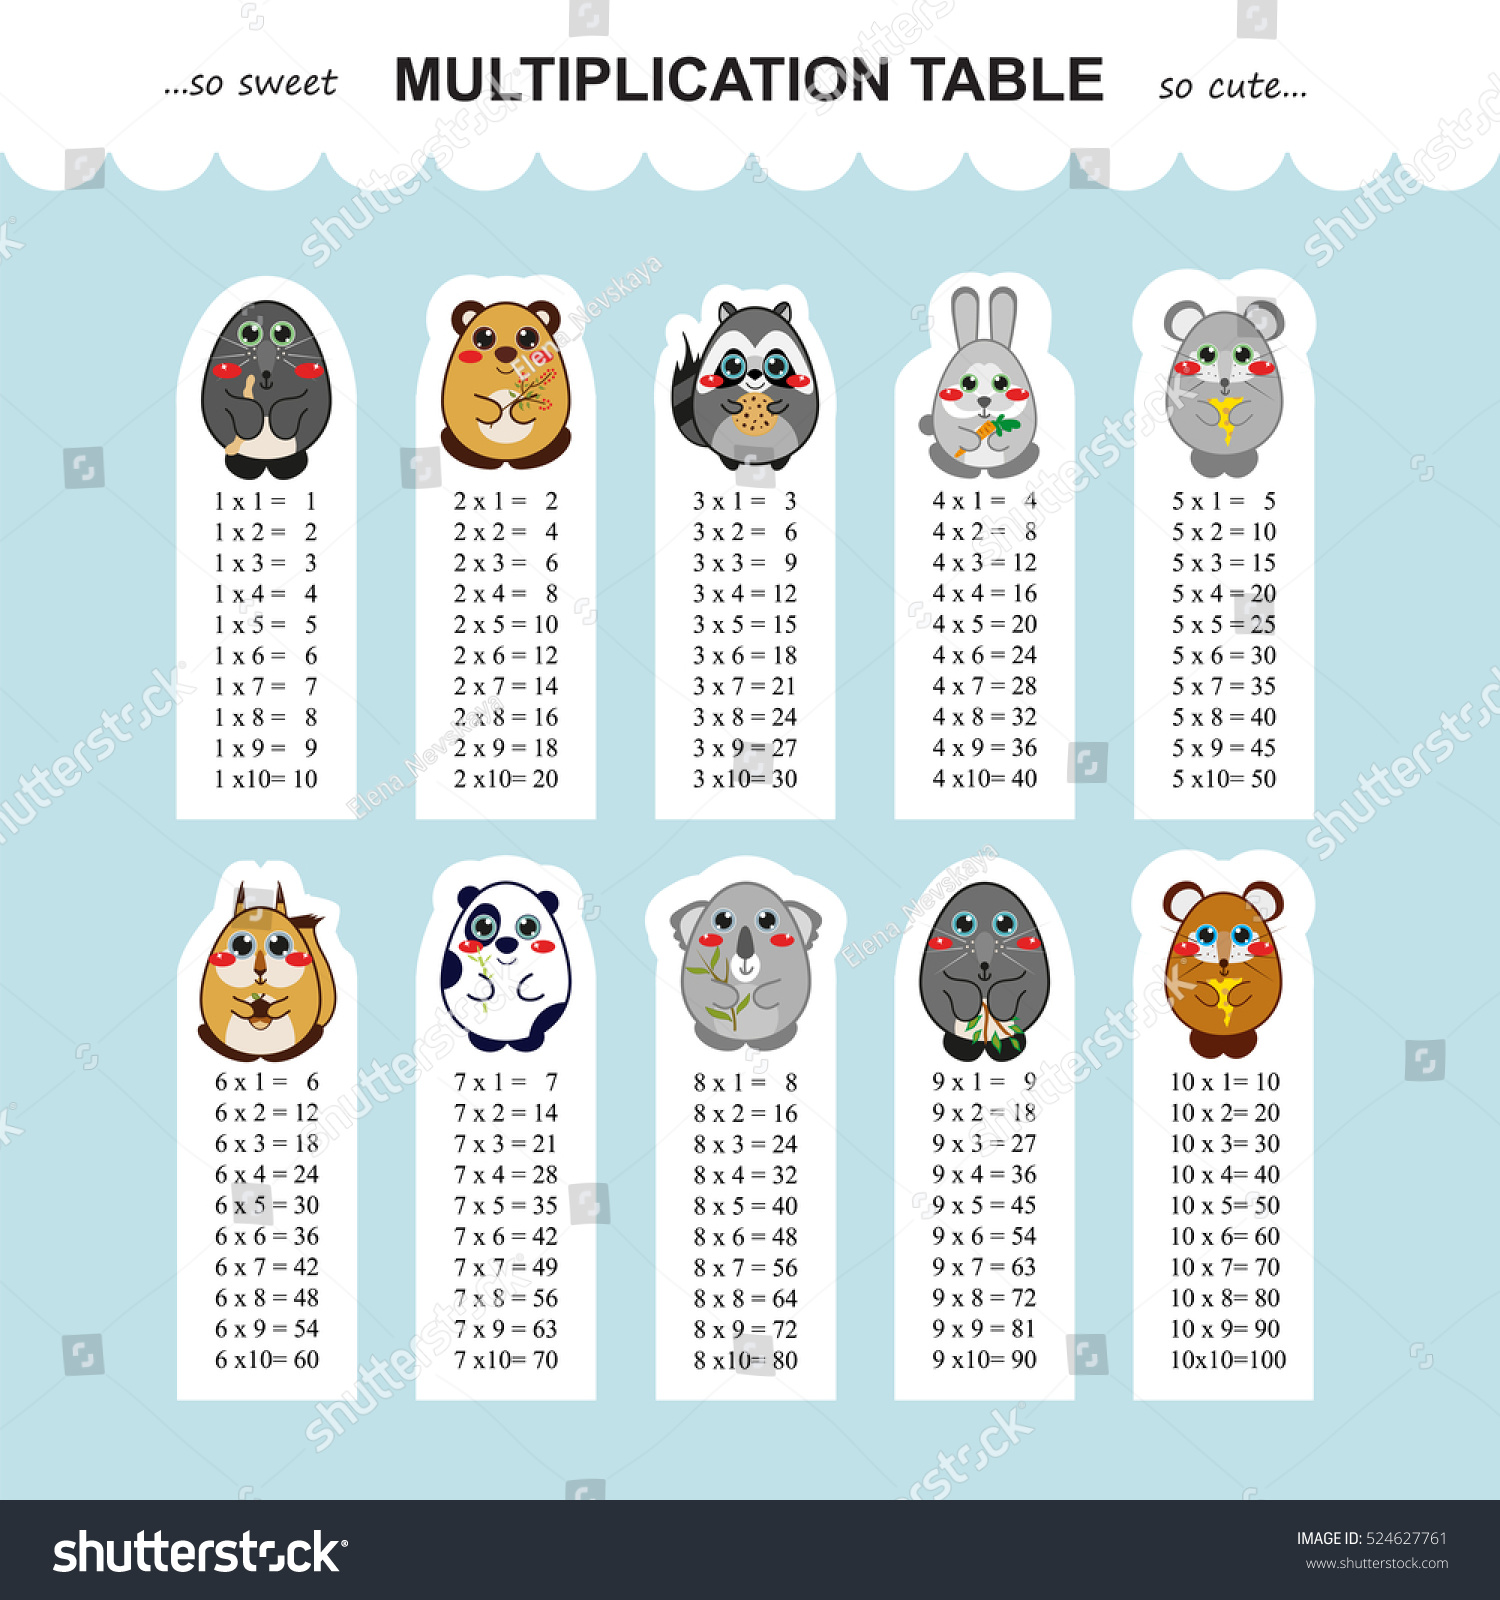 Vector multiplication table printable bookmarks stickers stock vector multiplication table printable bookmarks or stickers with multiple tables kids design kawaii gamestrikefo Image collections